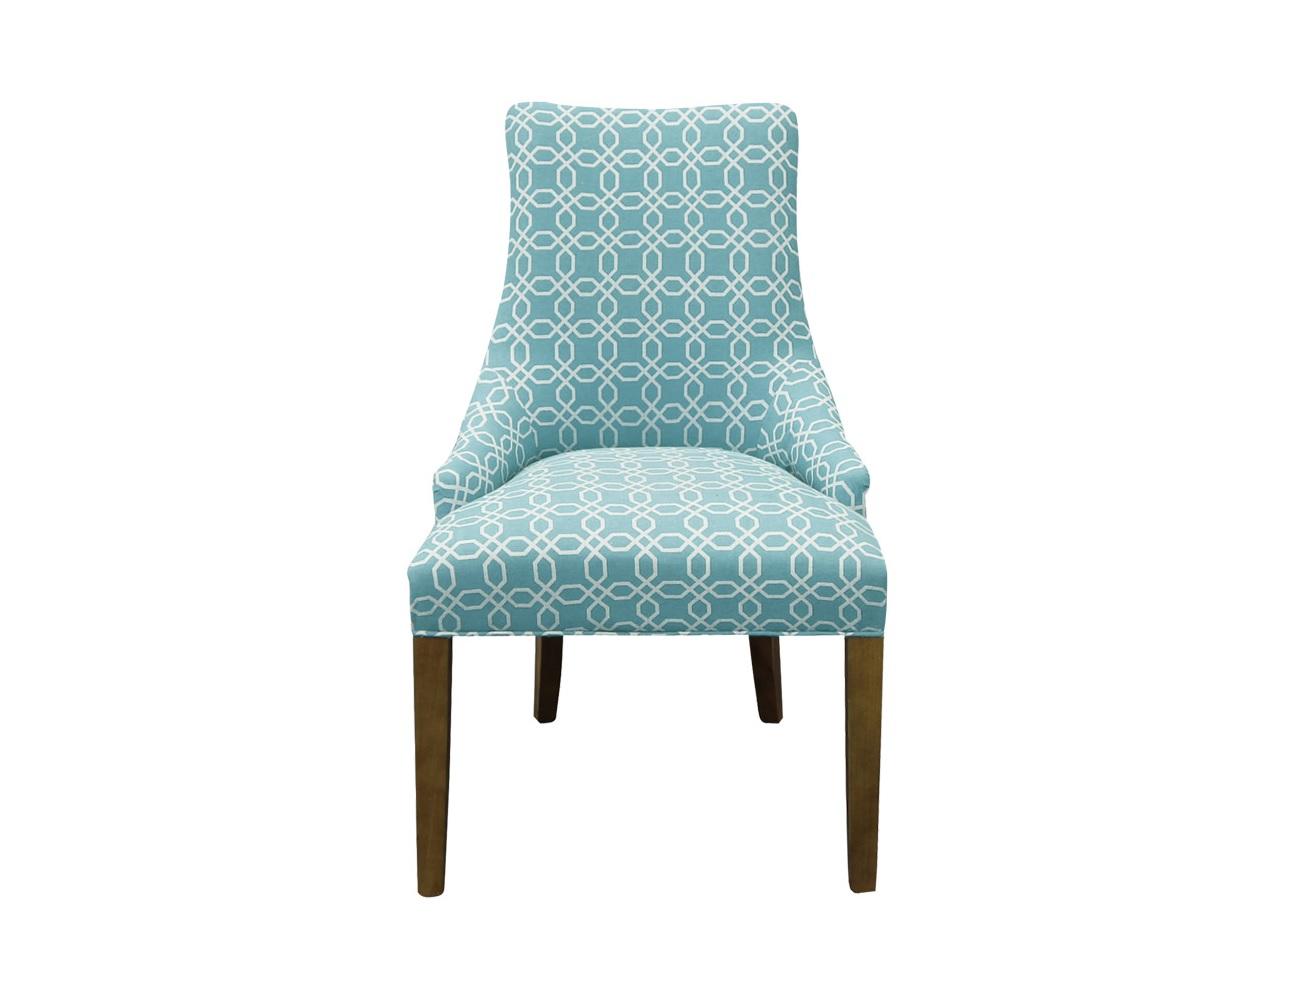 Полукресло Martin ll arm chairПолукресла<br><br><br>Material: Текстиль<br>Width см: 61<br>Depth см: 69<br>Height см: 98